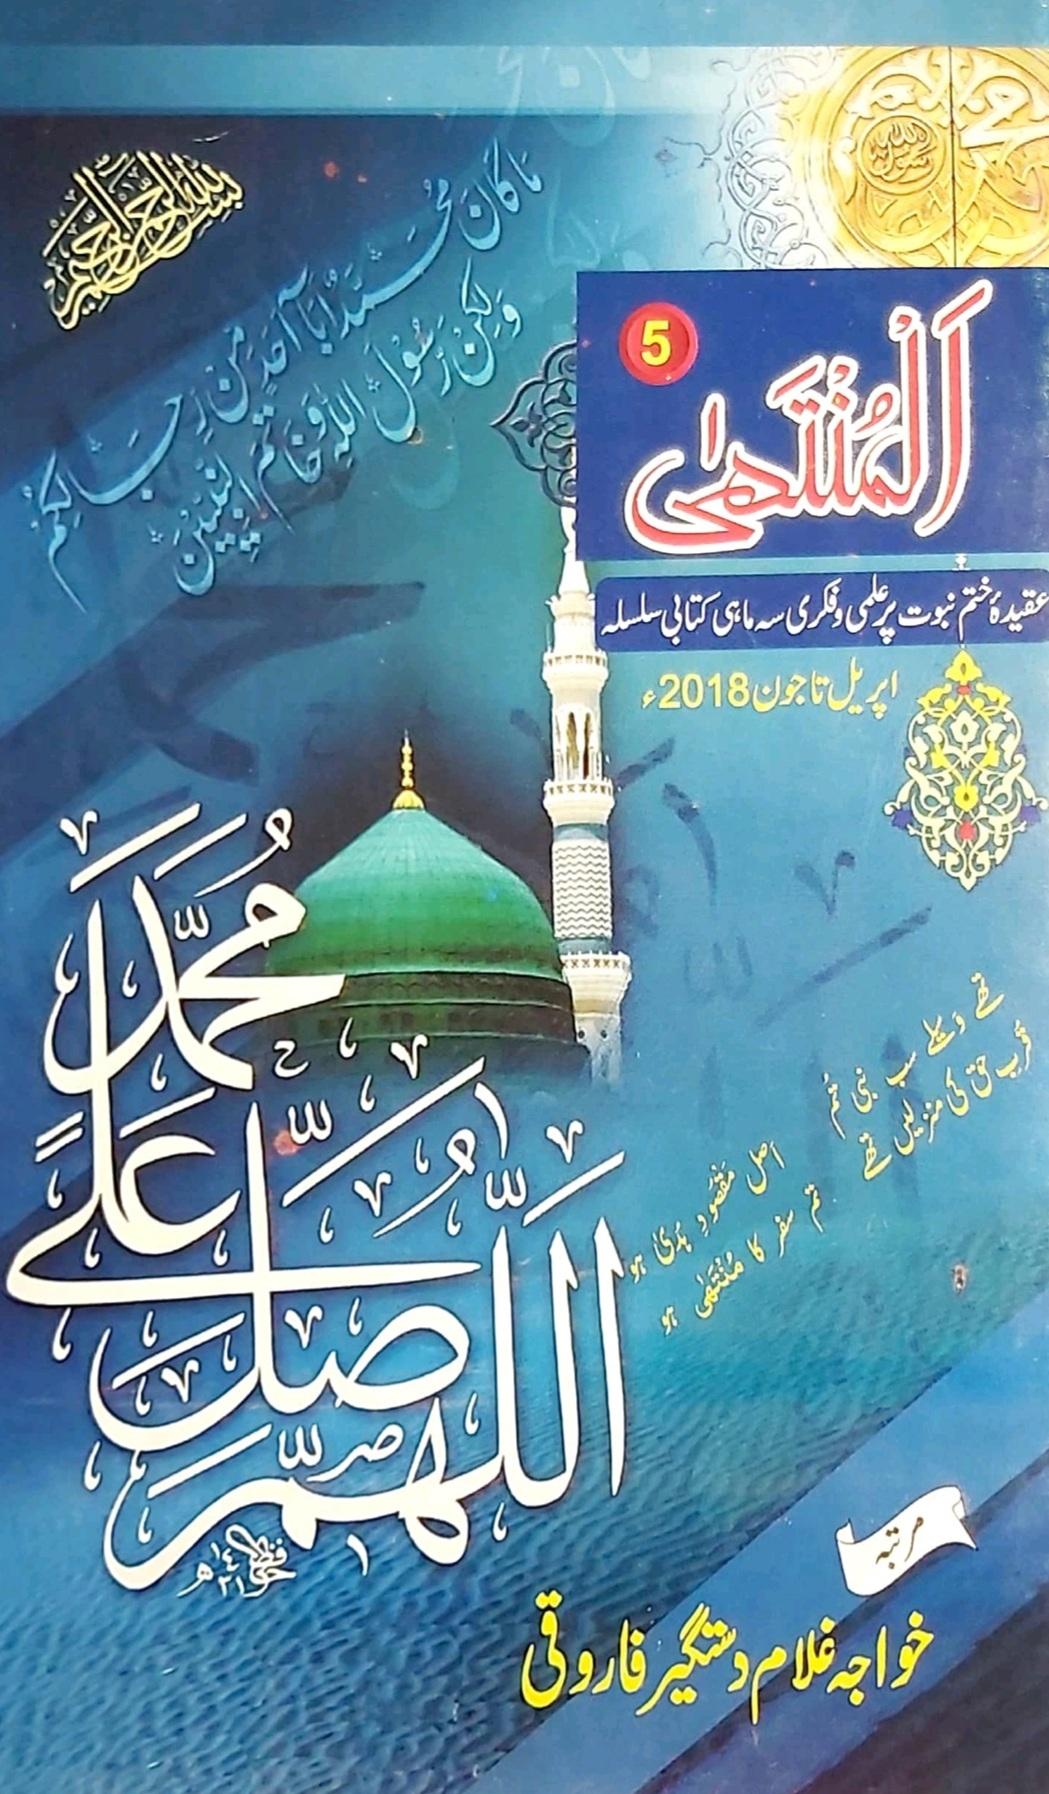 Al Muntahaa Shumarah # 5 / المنتہی المنتھی شمارہ # 5by خواجہ غلام دستگیر فاروقی